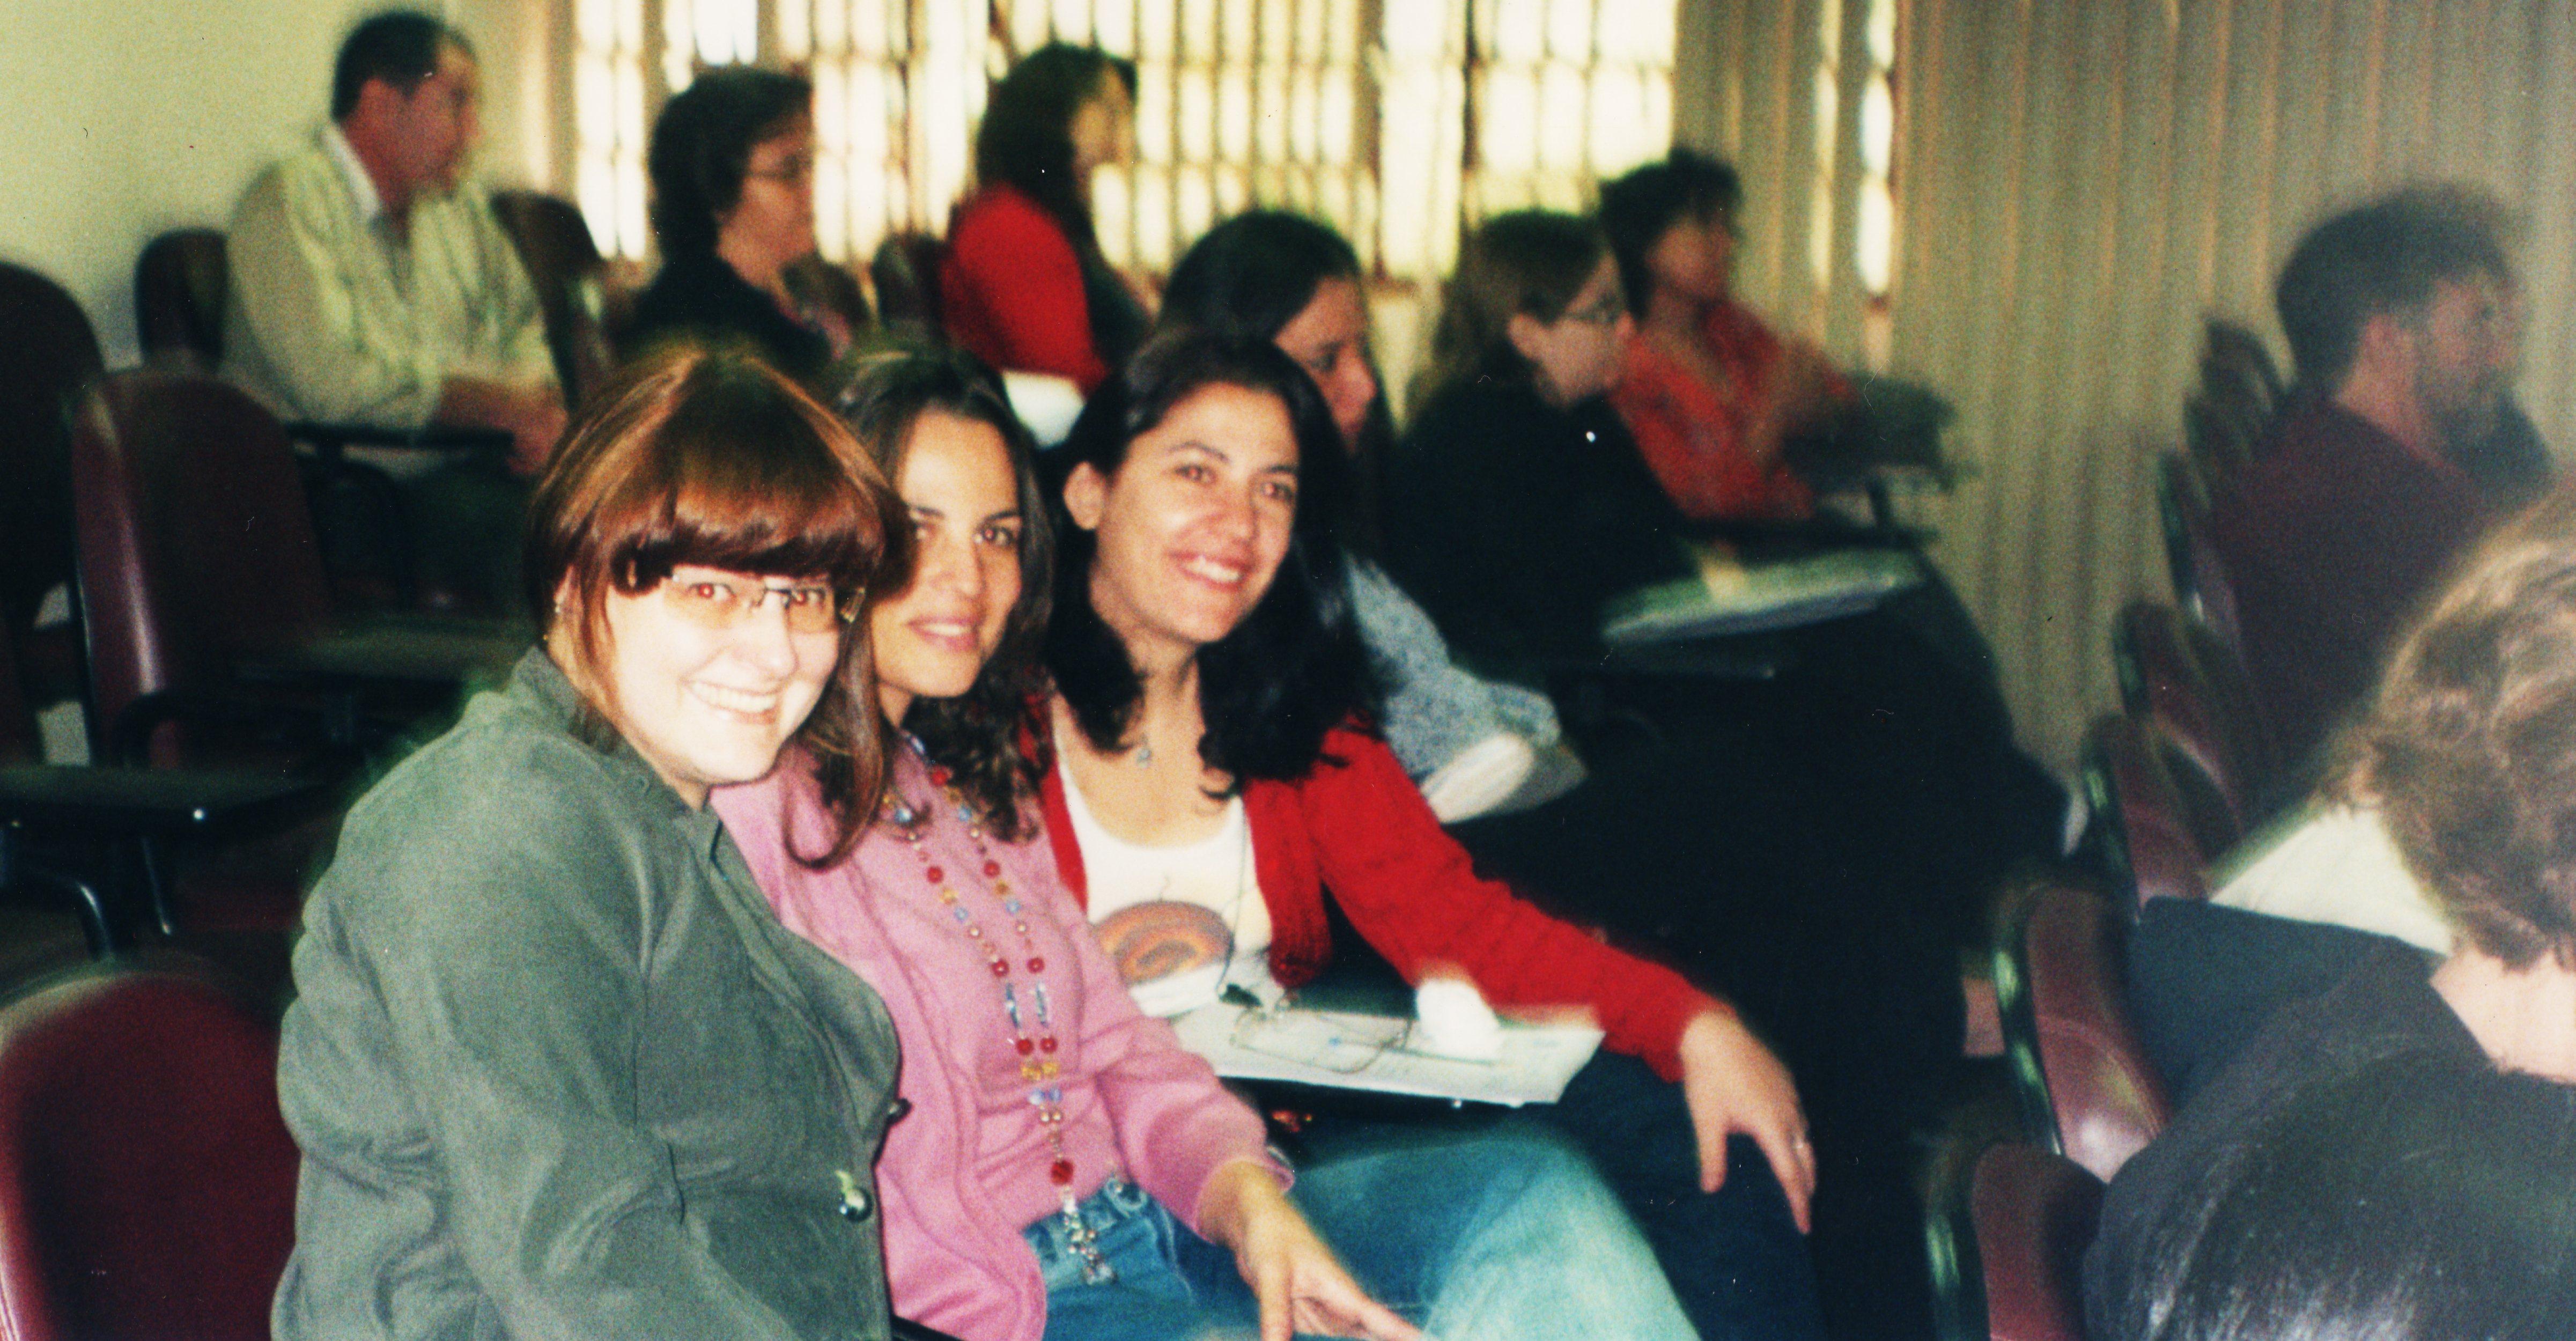 Laboratório Saúde Mental e Psicologia Clínica Social 20 anos 007